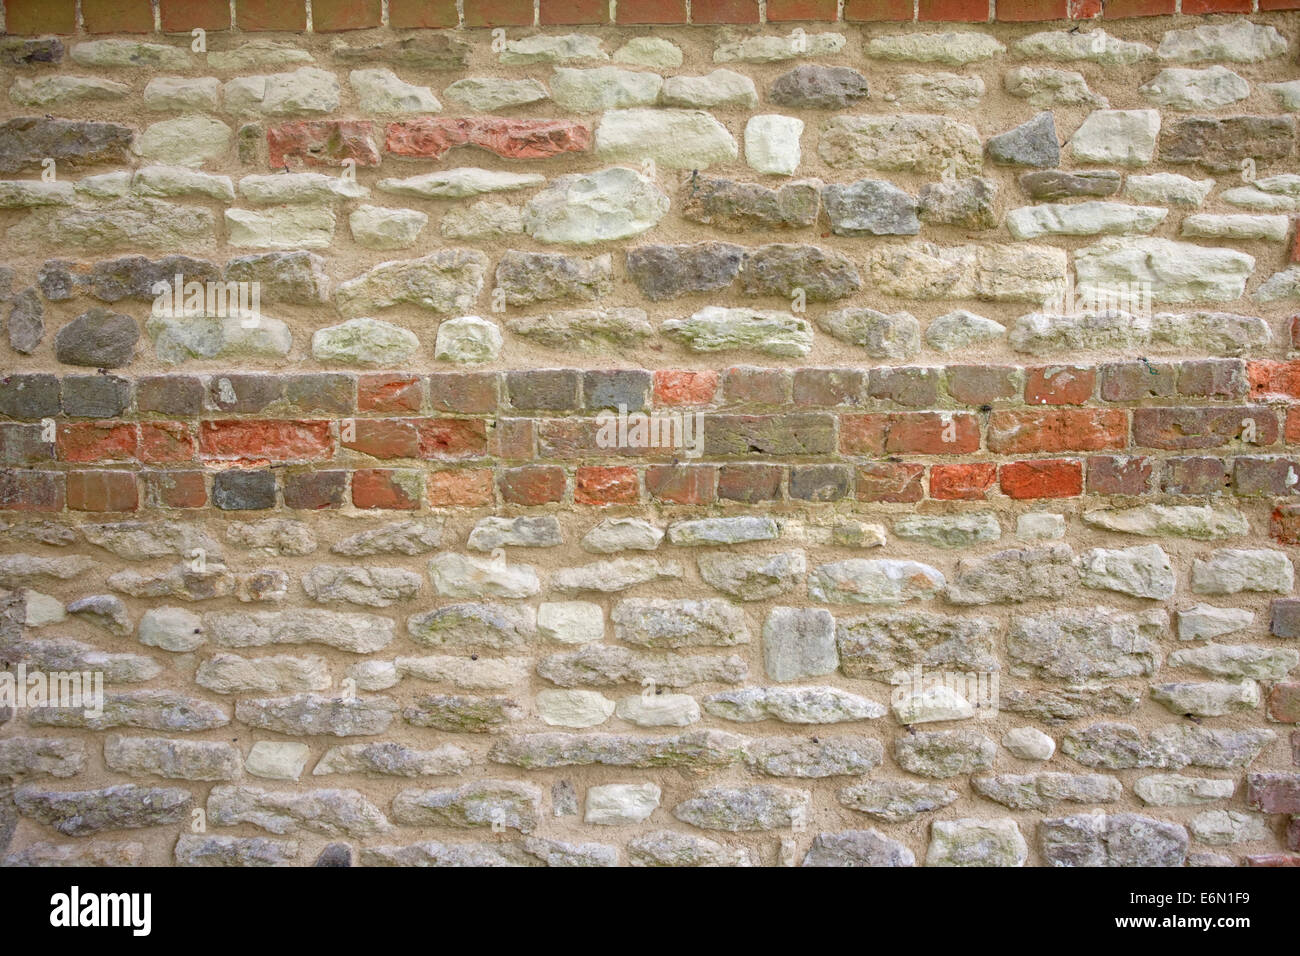 Georgian chalk stone and reclaimed brick wall - Stock Image